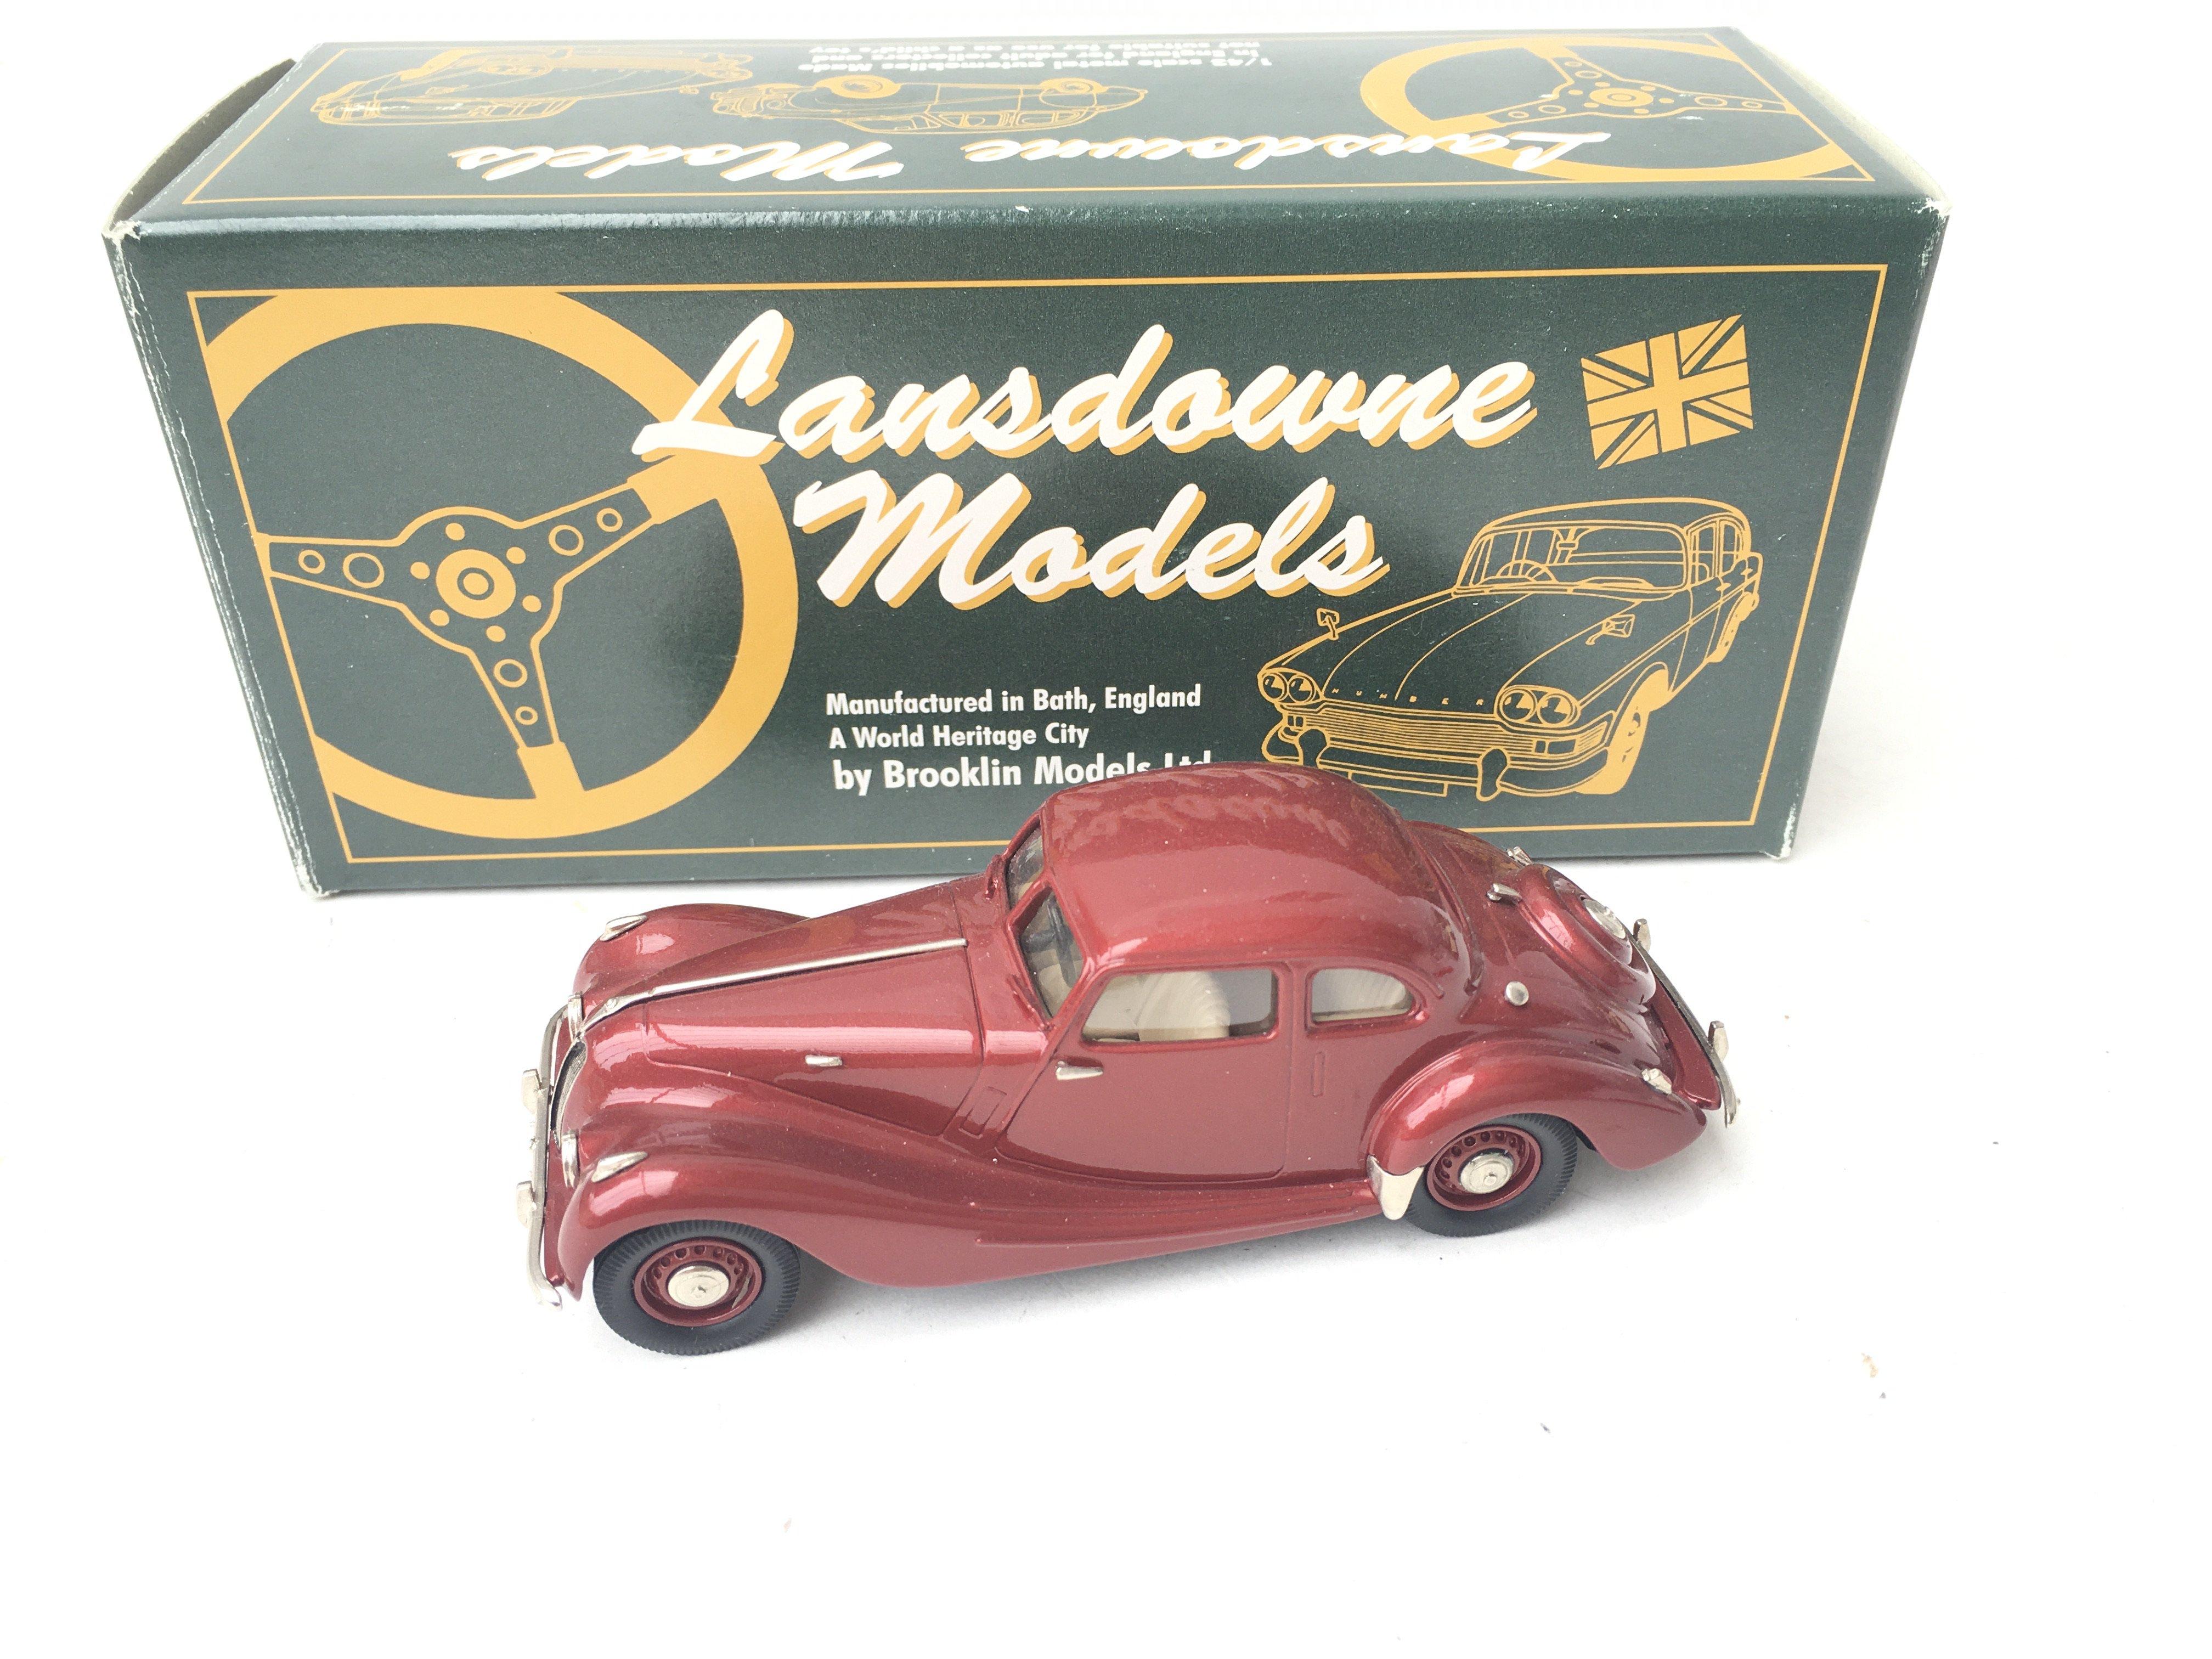 2 X Lansdowne Models. LDM 31 1947 Bristol 400 And - Image 2 of 3